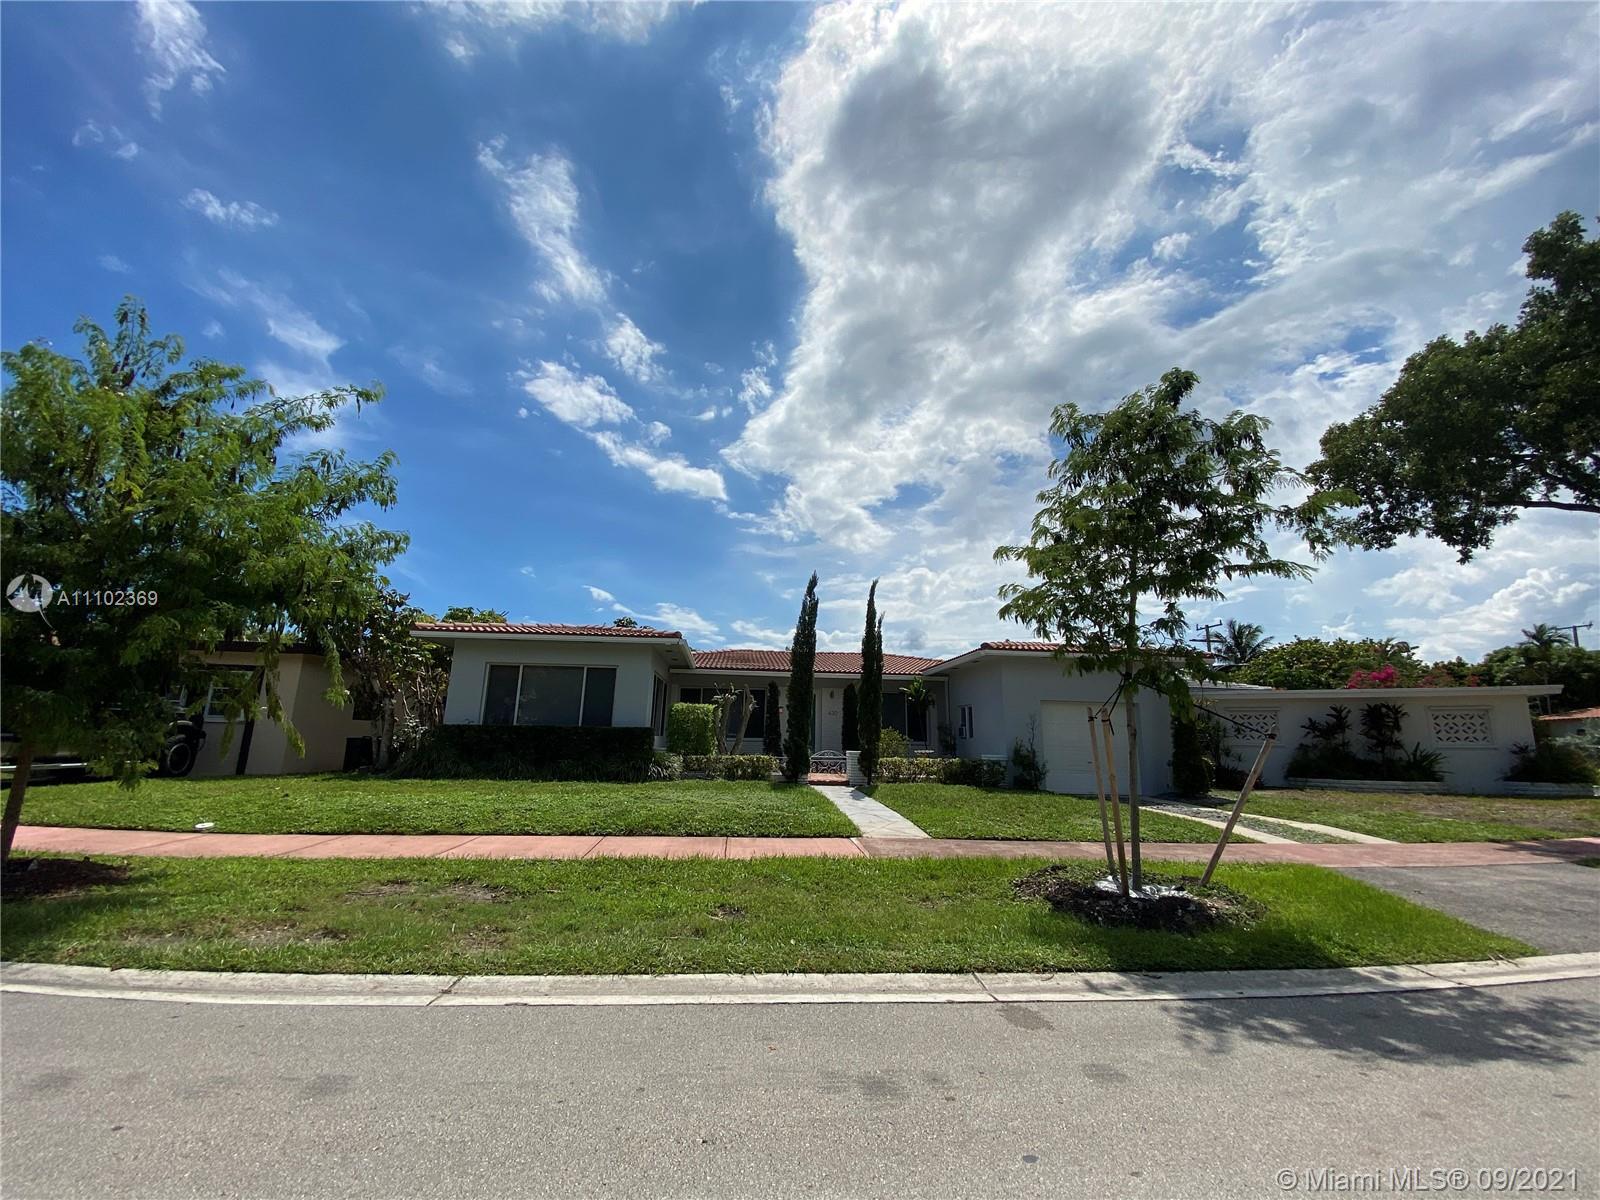 Single Family Home,For Rent,430 N Shore Dr, Miami Beach, Florida 33141,Brickell,realty,broker,condos near me